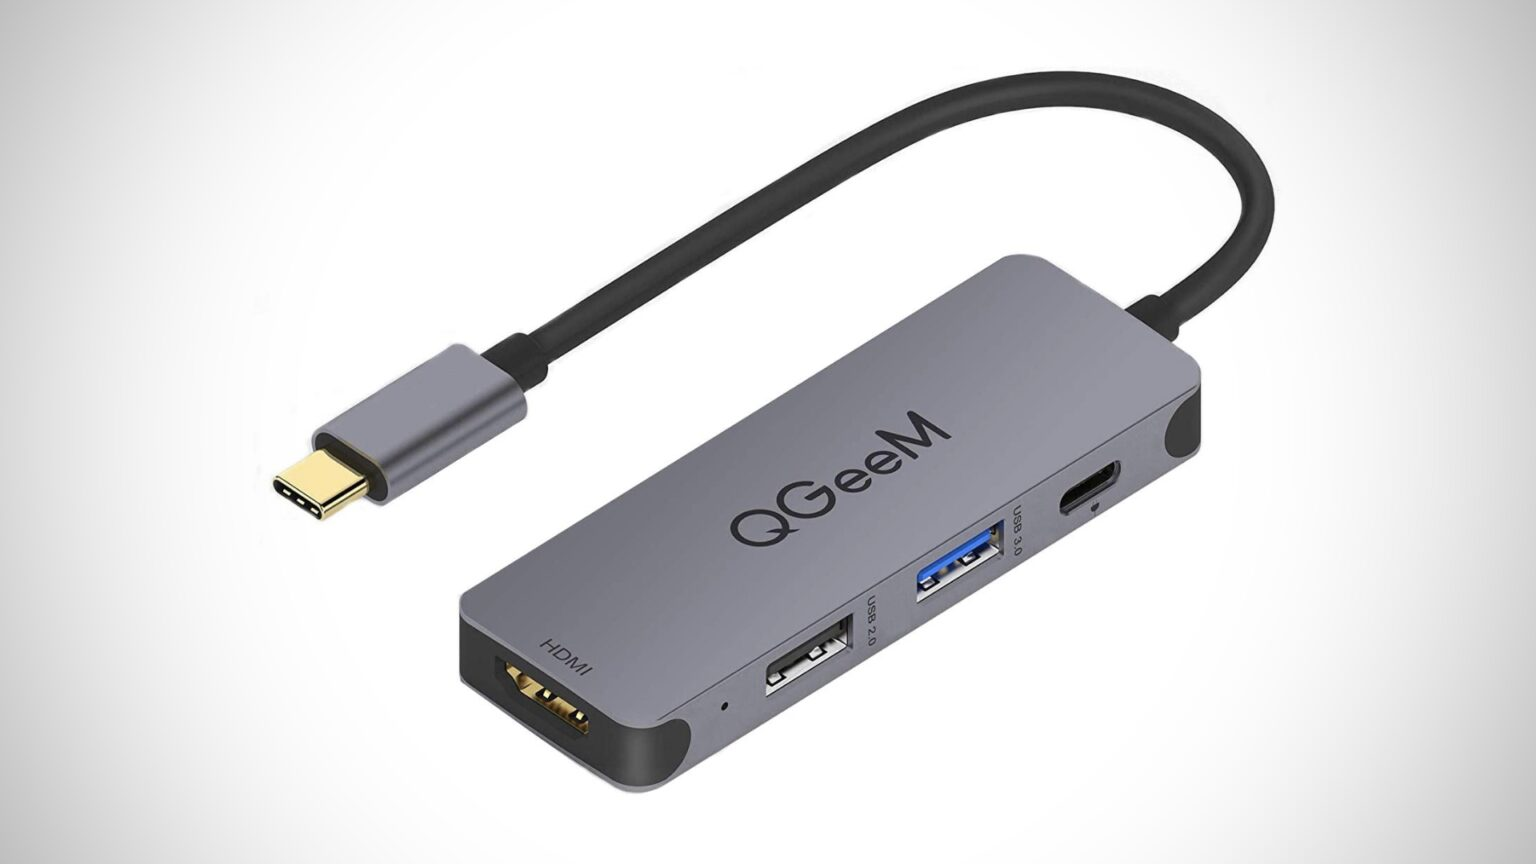 Save on the QGeeM USB-C hub